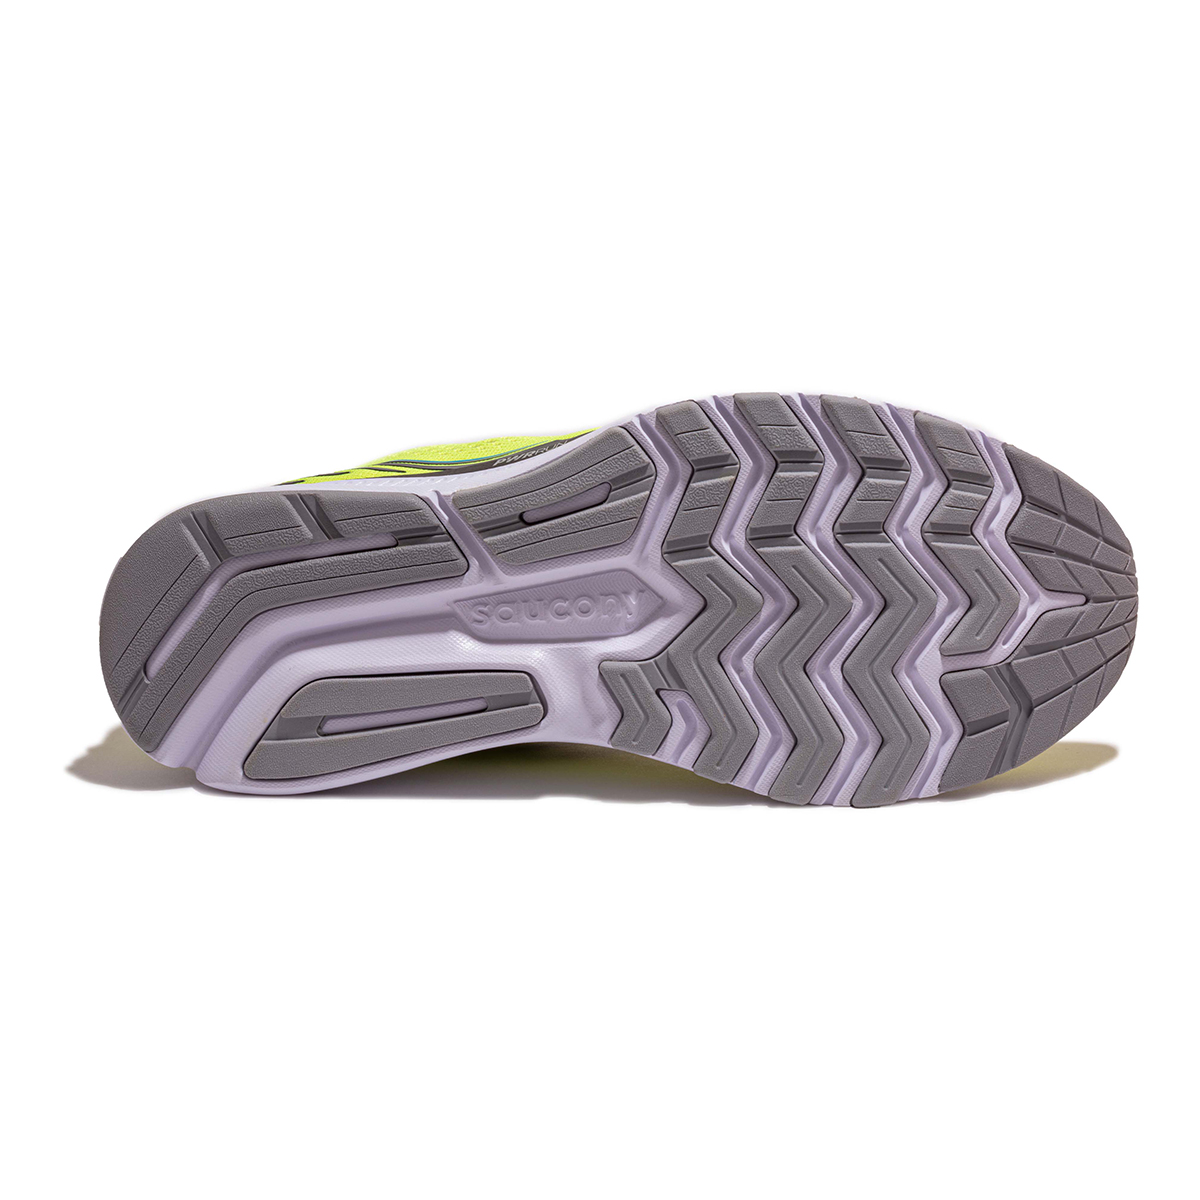 Men's Saucony Ride 14 Running Shoe - Color: Citrus / Black - Size: 7 - Width: Regular, Citrus / Black, large, image 5